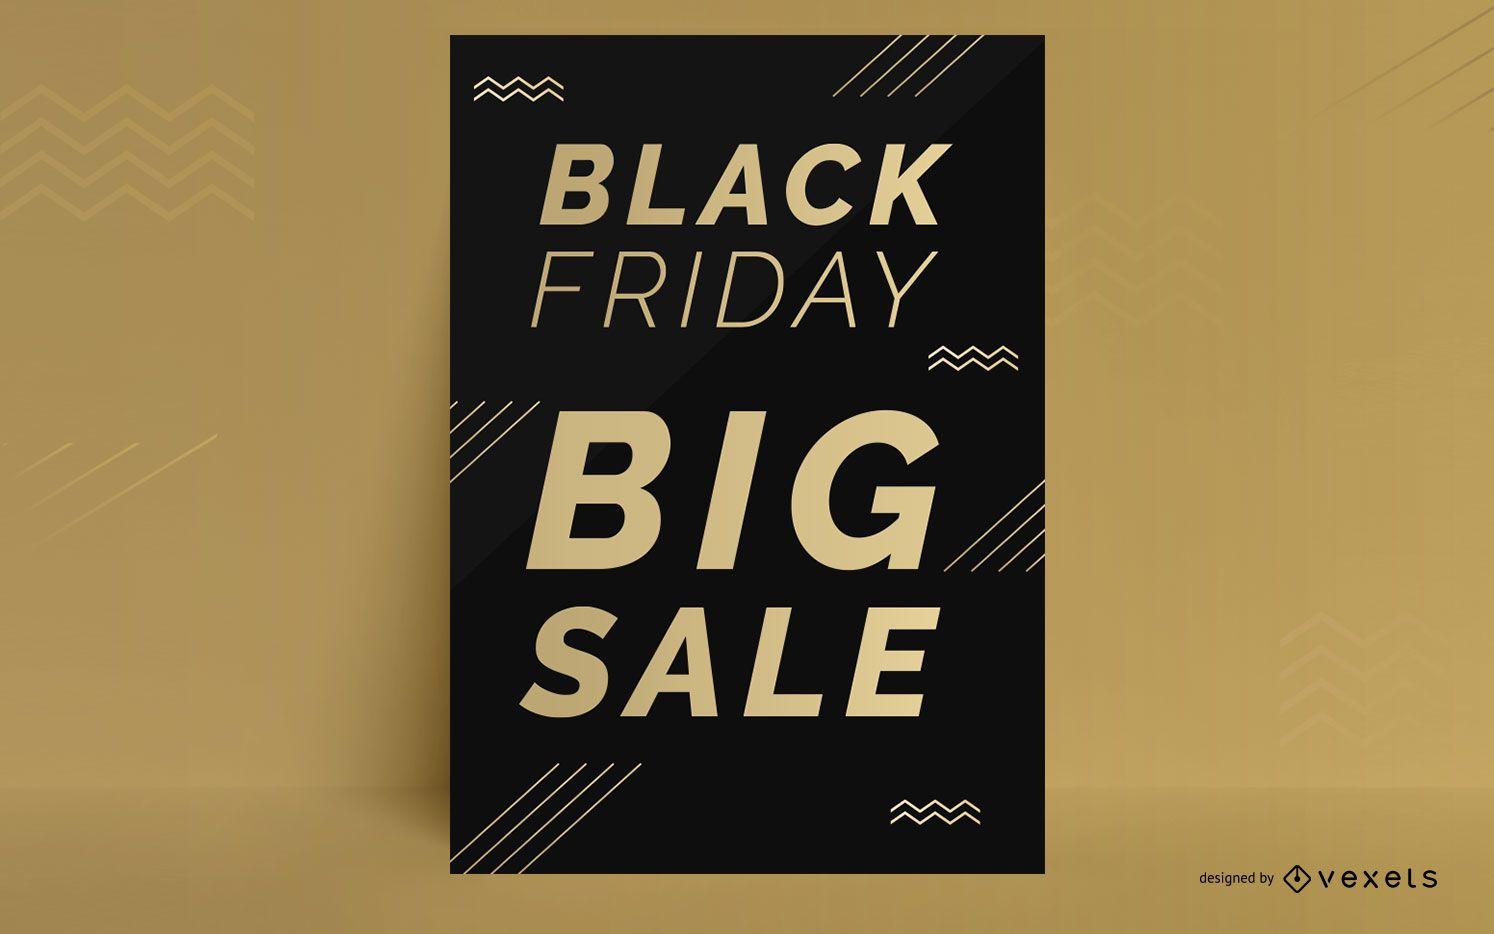 Black friday discount poster design